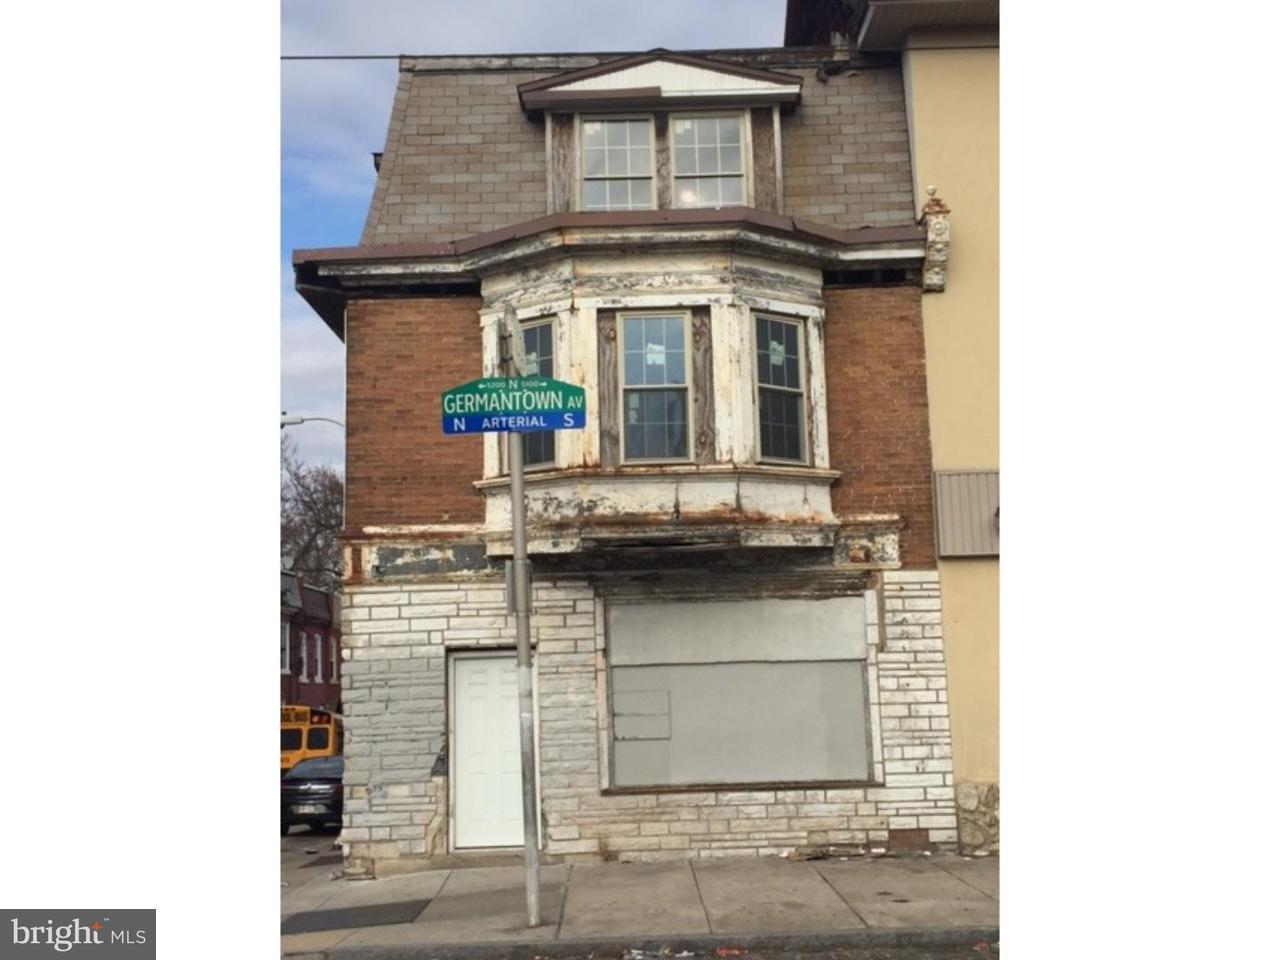 5155  Germantown Philadelphia, PA 19144